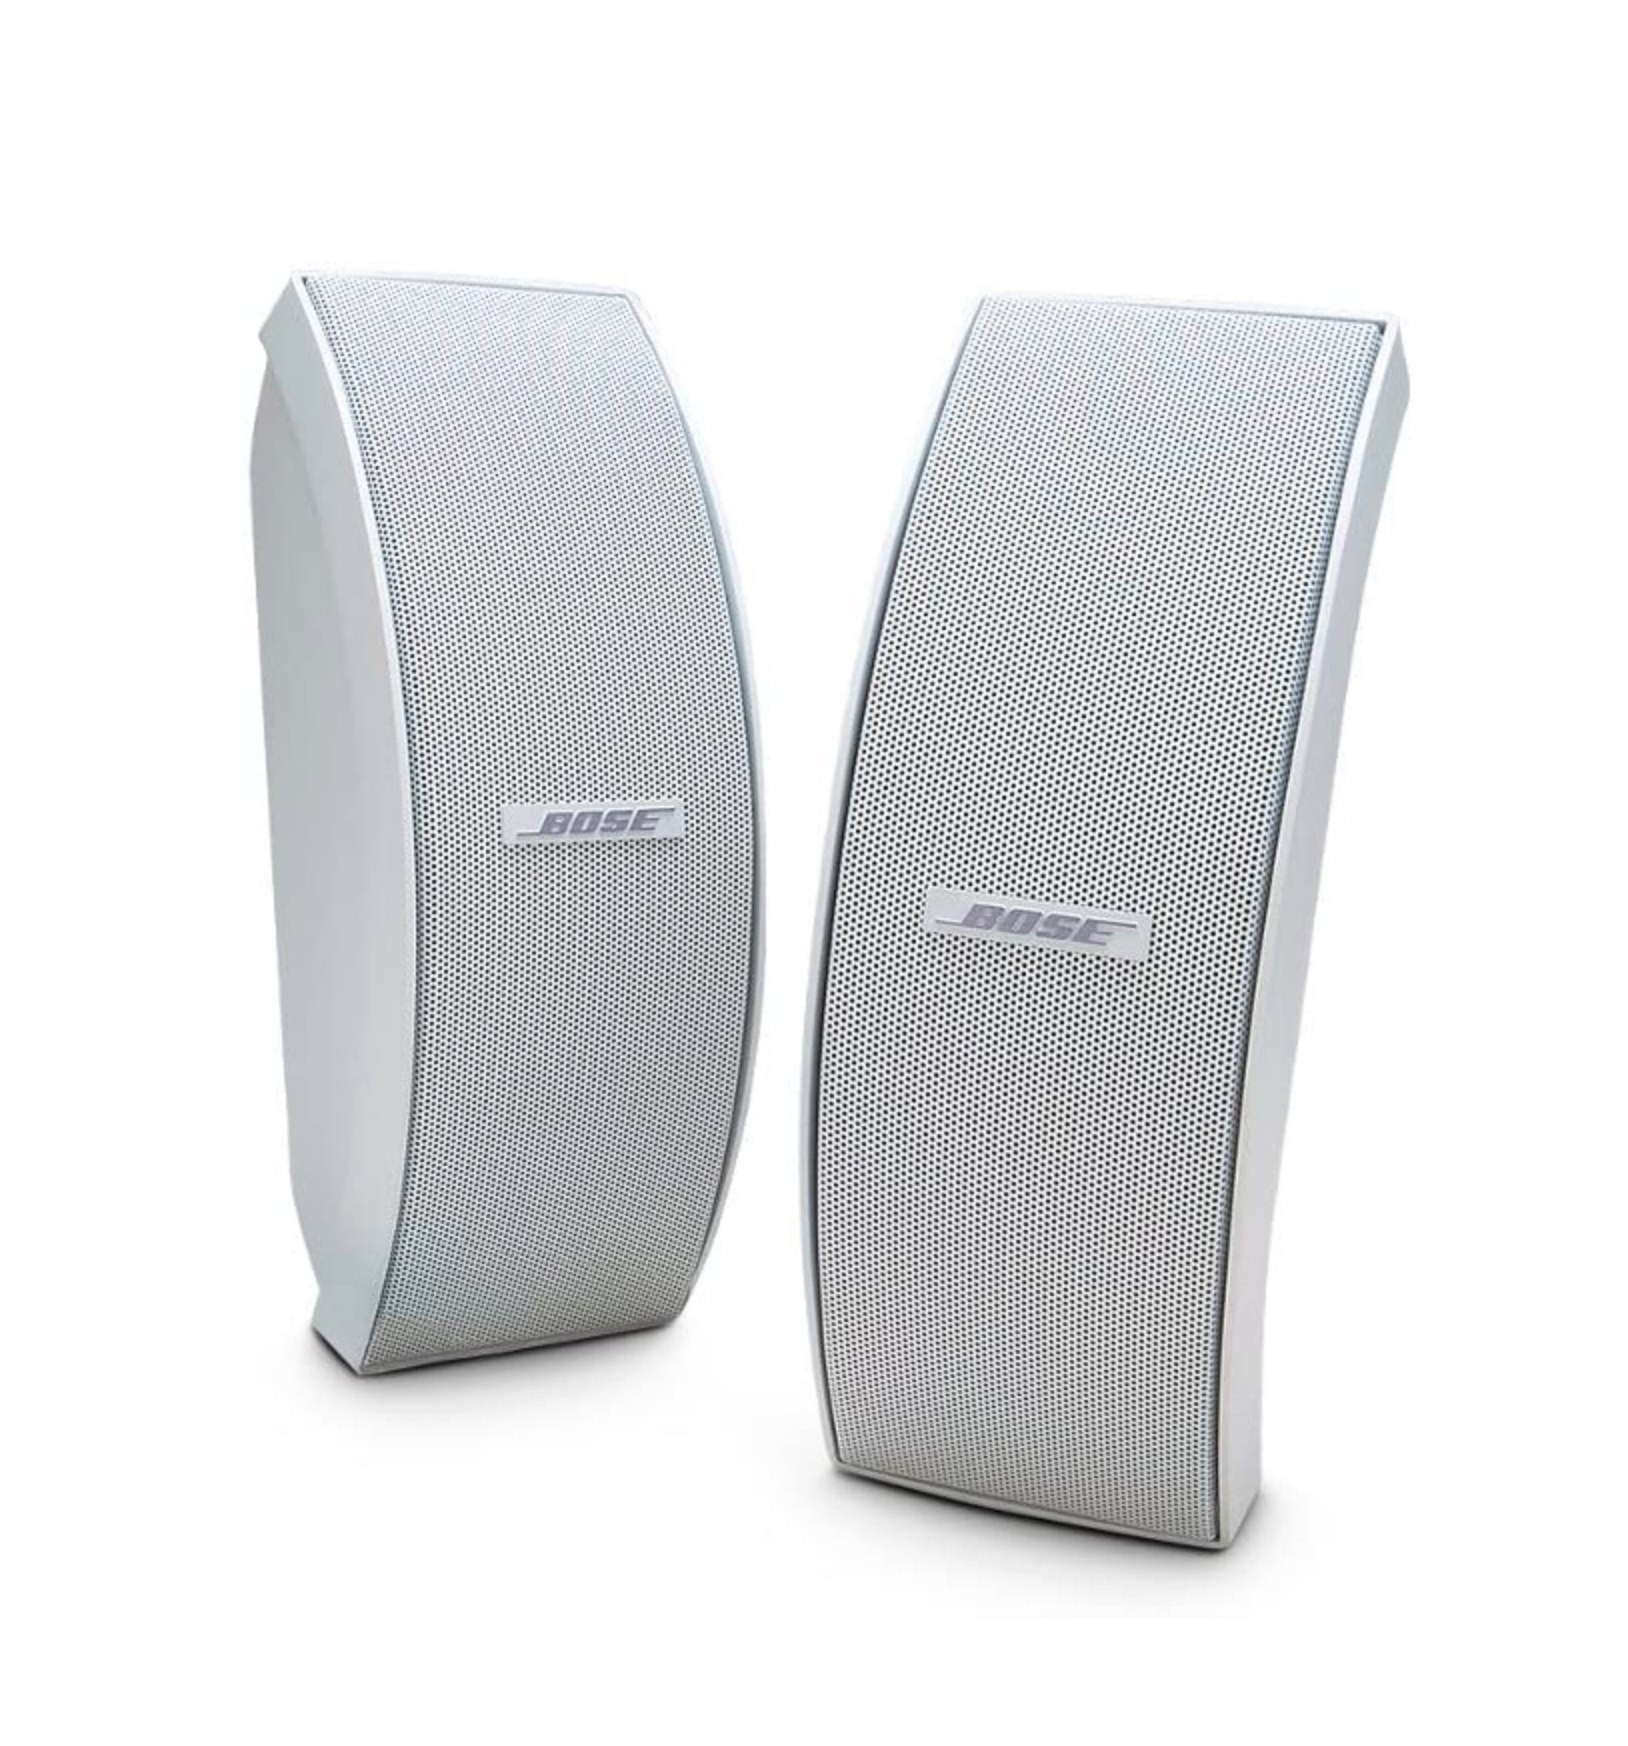 Bose 151 Se Alto-falantes Ambientes Externo Branco 1 Par